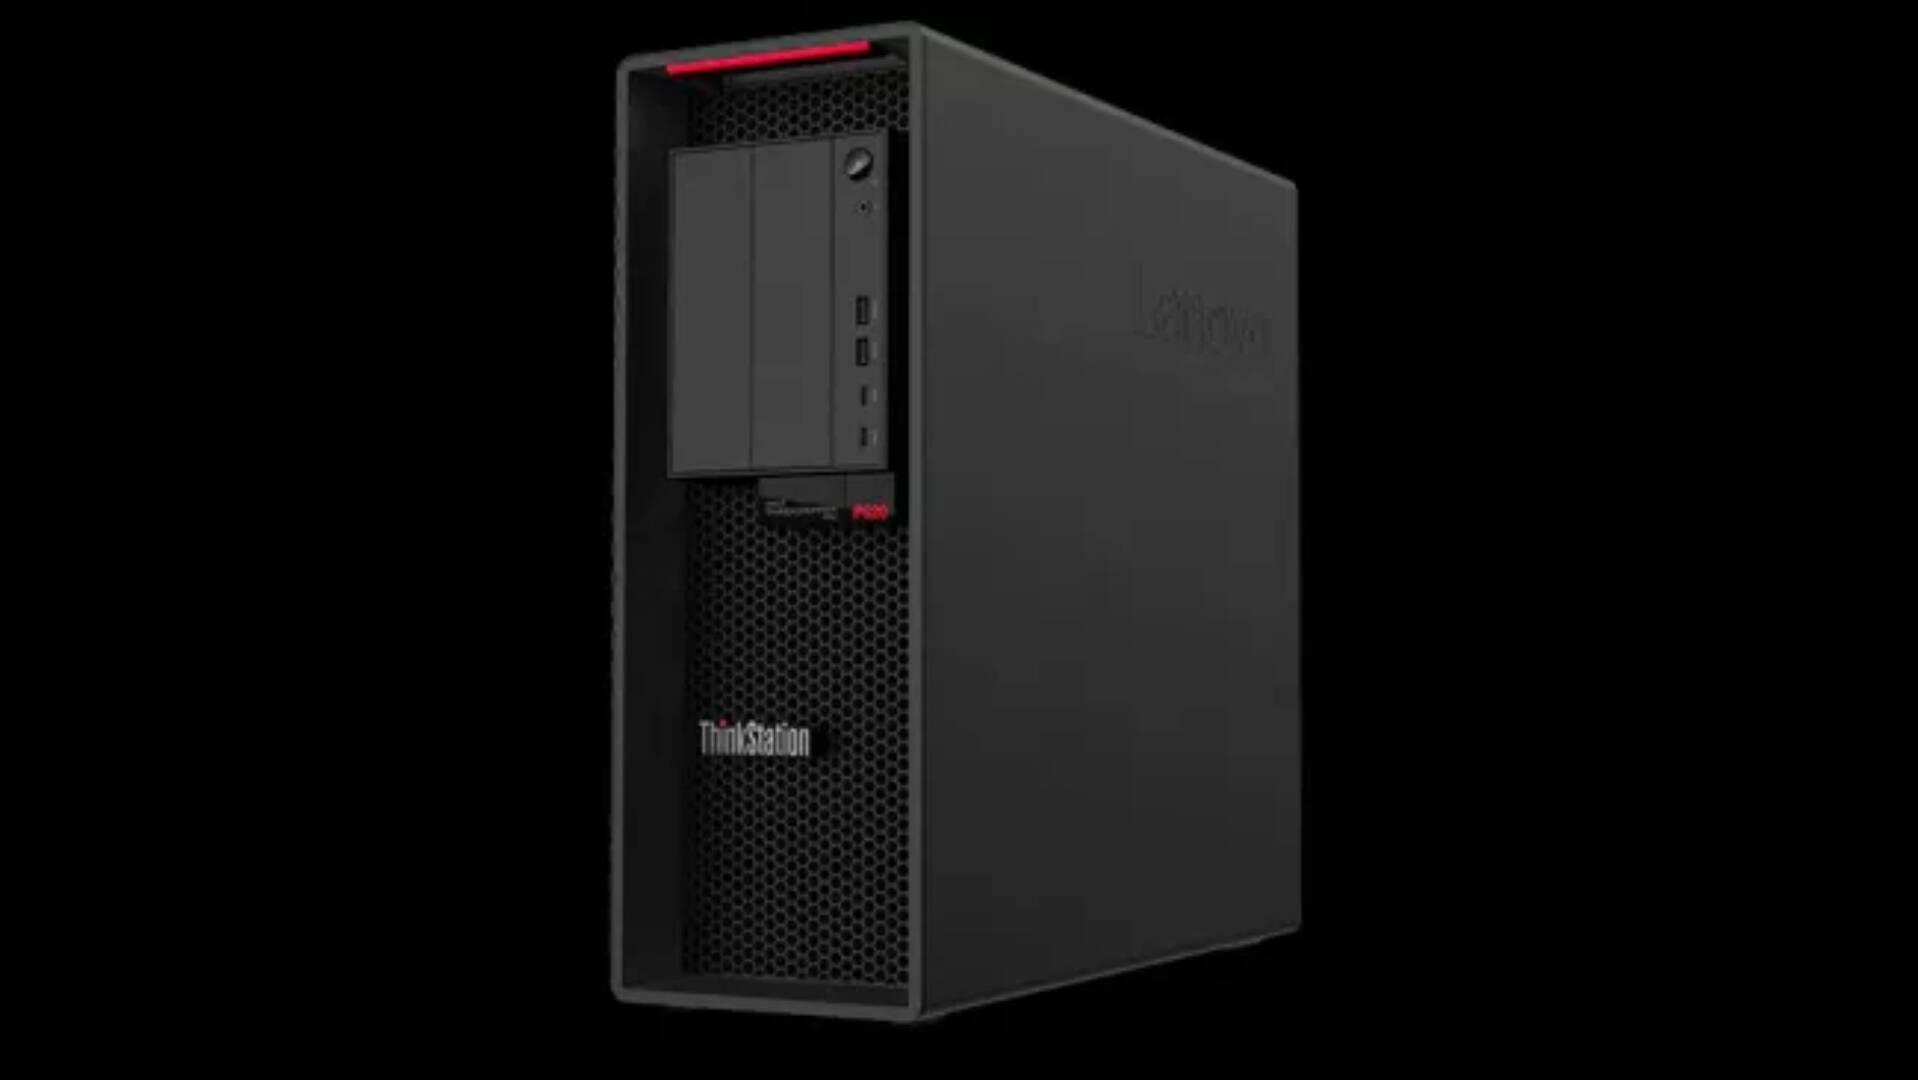 Lenovo Thinkstation AMD Threadripper Pro 3995WX